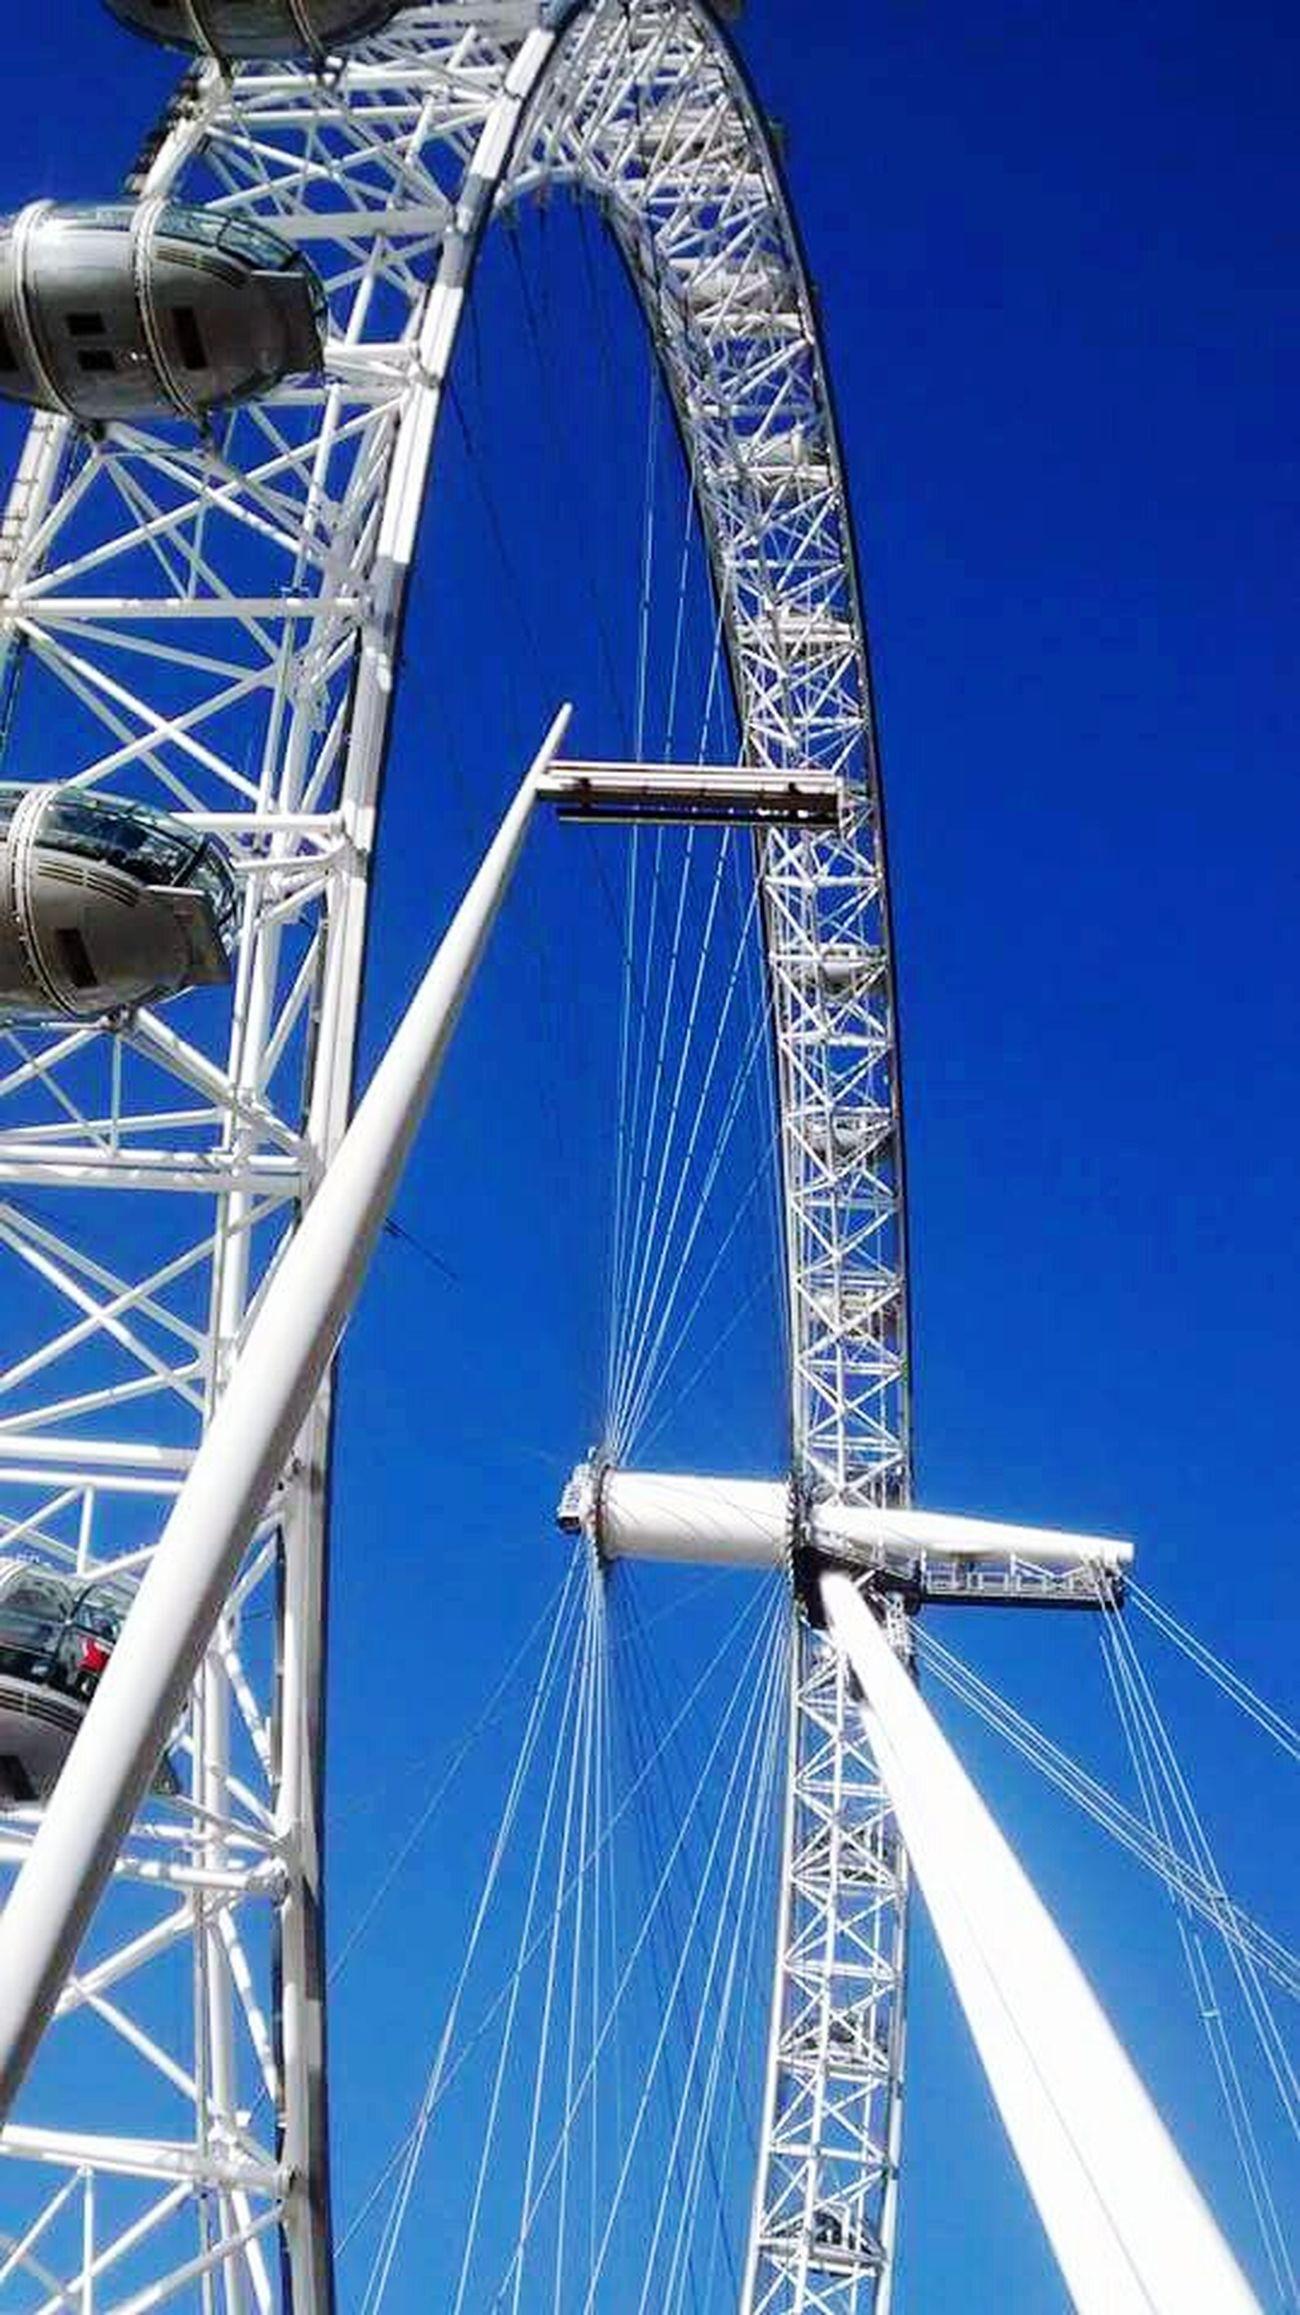 the london eye Thelondoneye London England Music Trip Sky Architecture Amazingviews